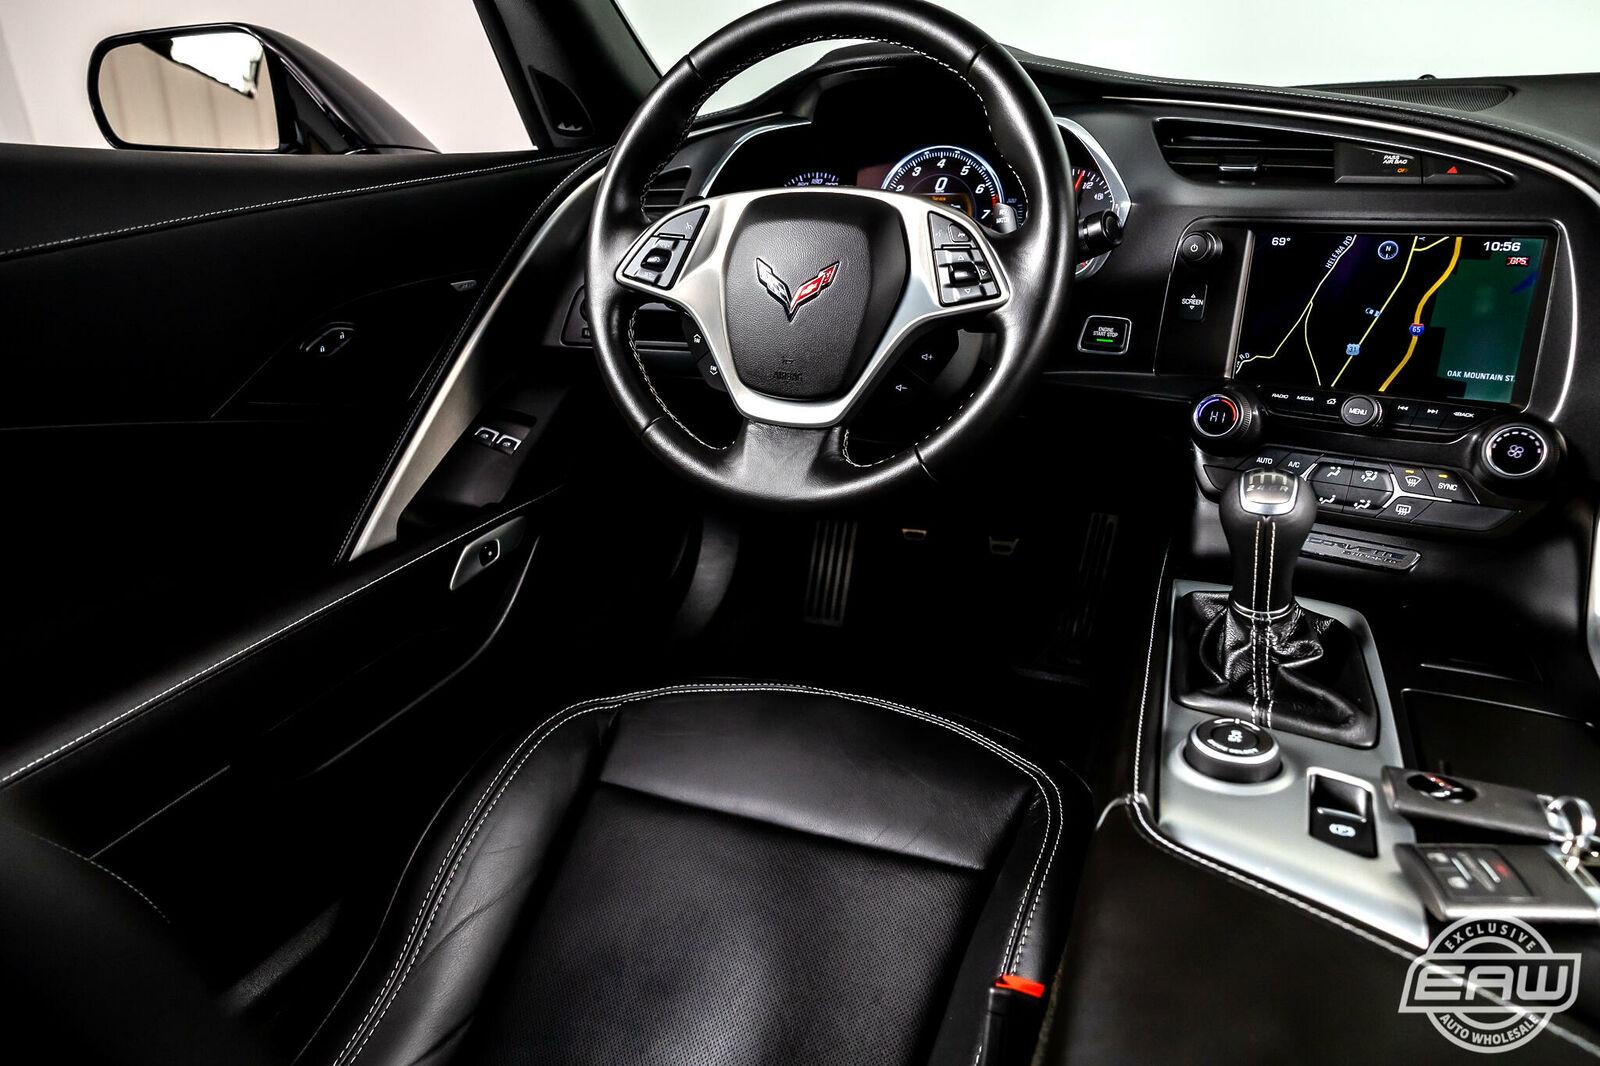 2014 Black Chevrolet Corvette Coupe 1LT | C7 Corvette Photo 7